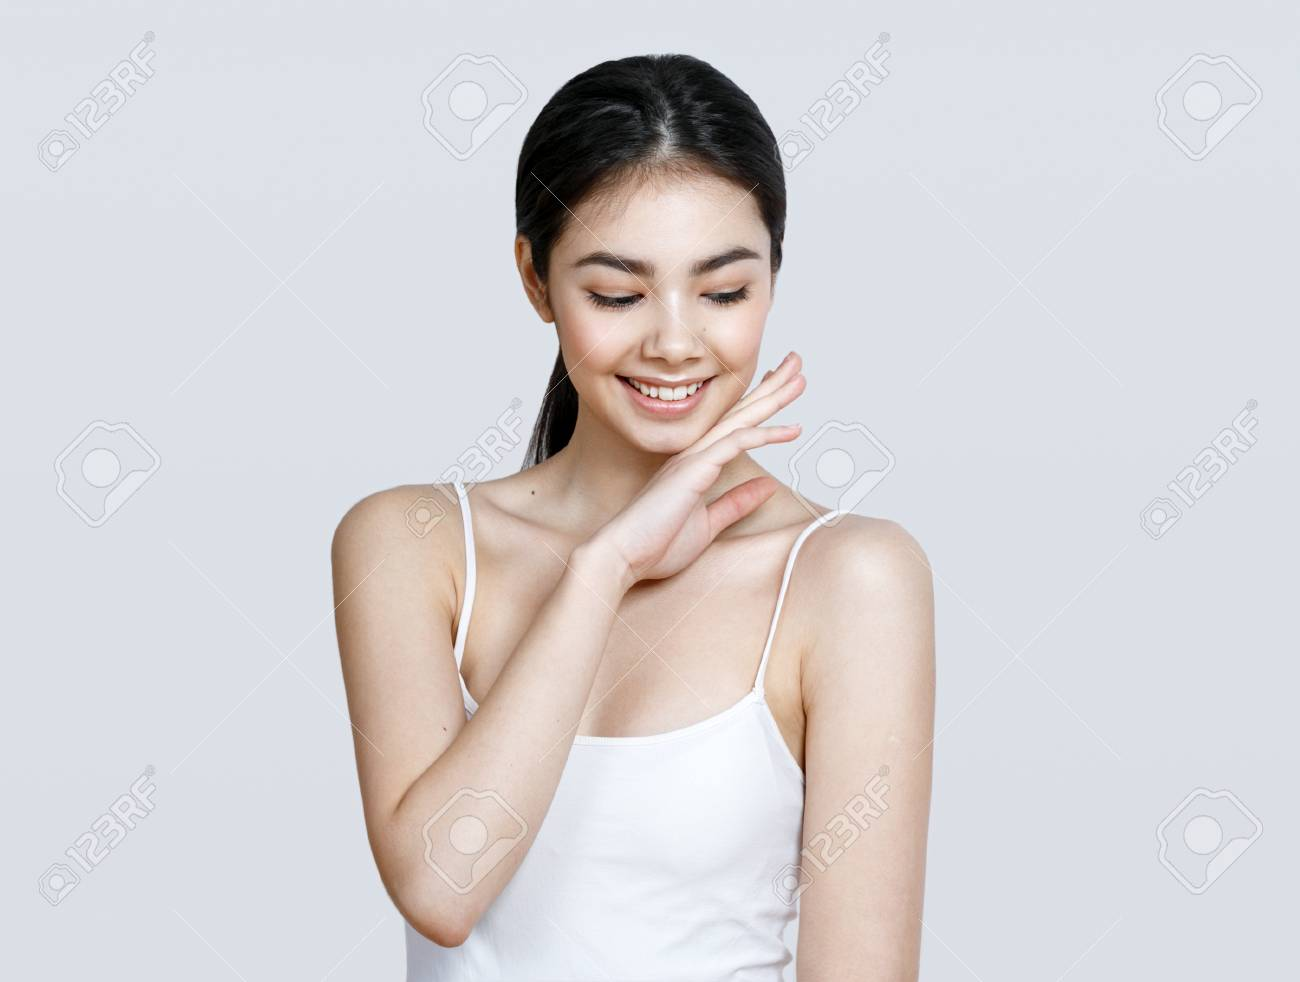 Asian woman girl beauty portrait. Studio shot. Gray background. - 79426795